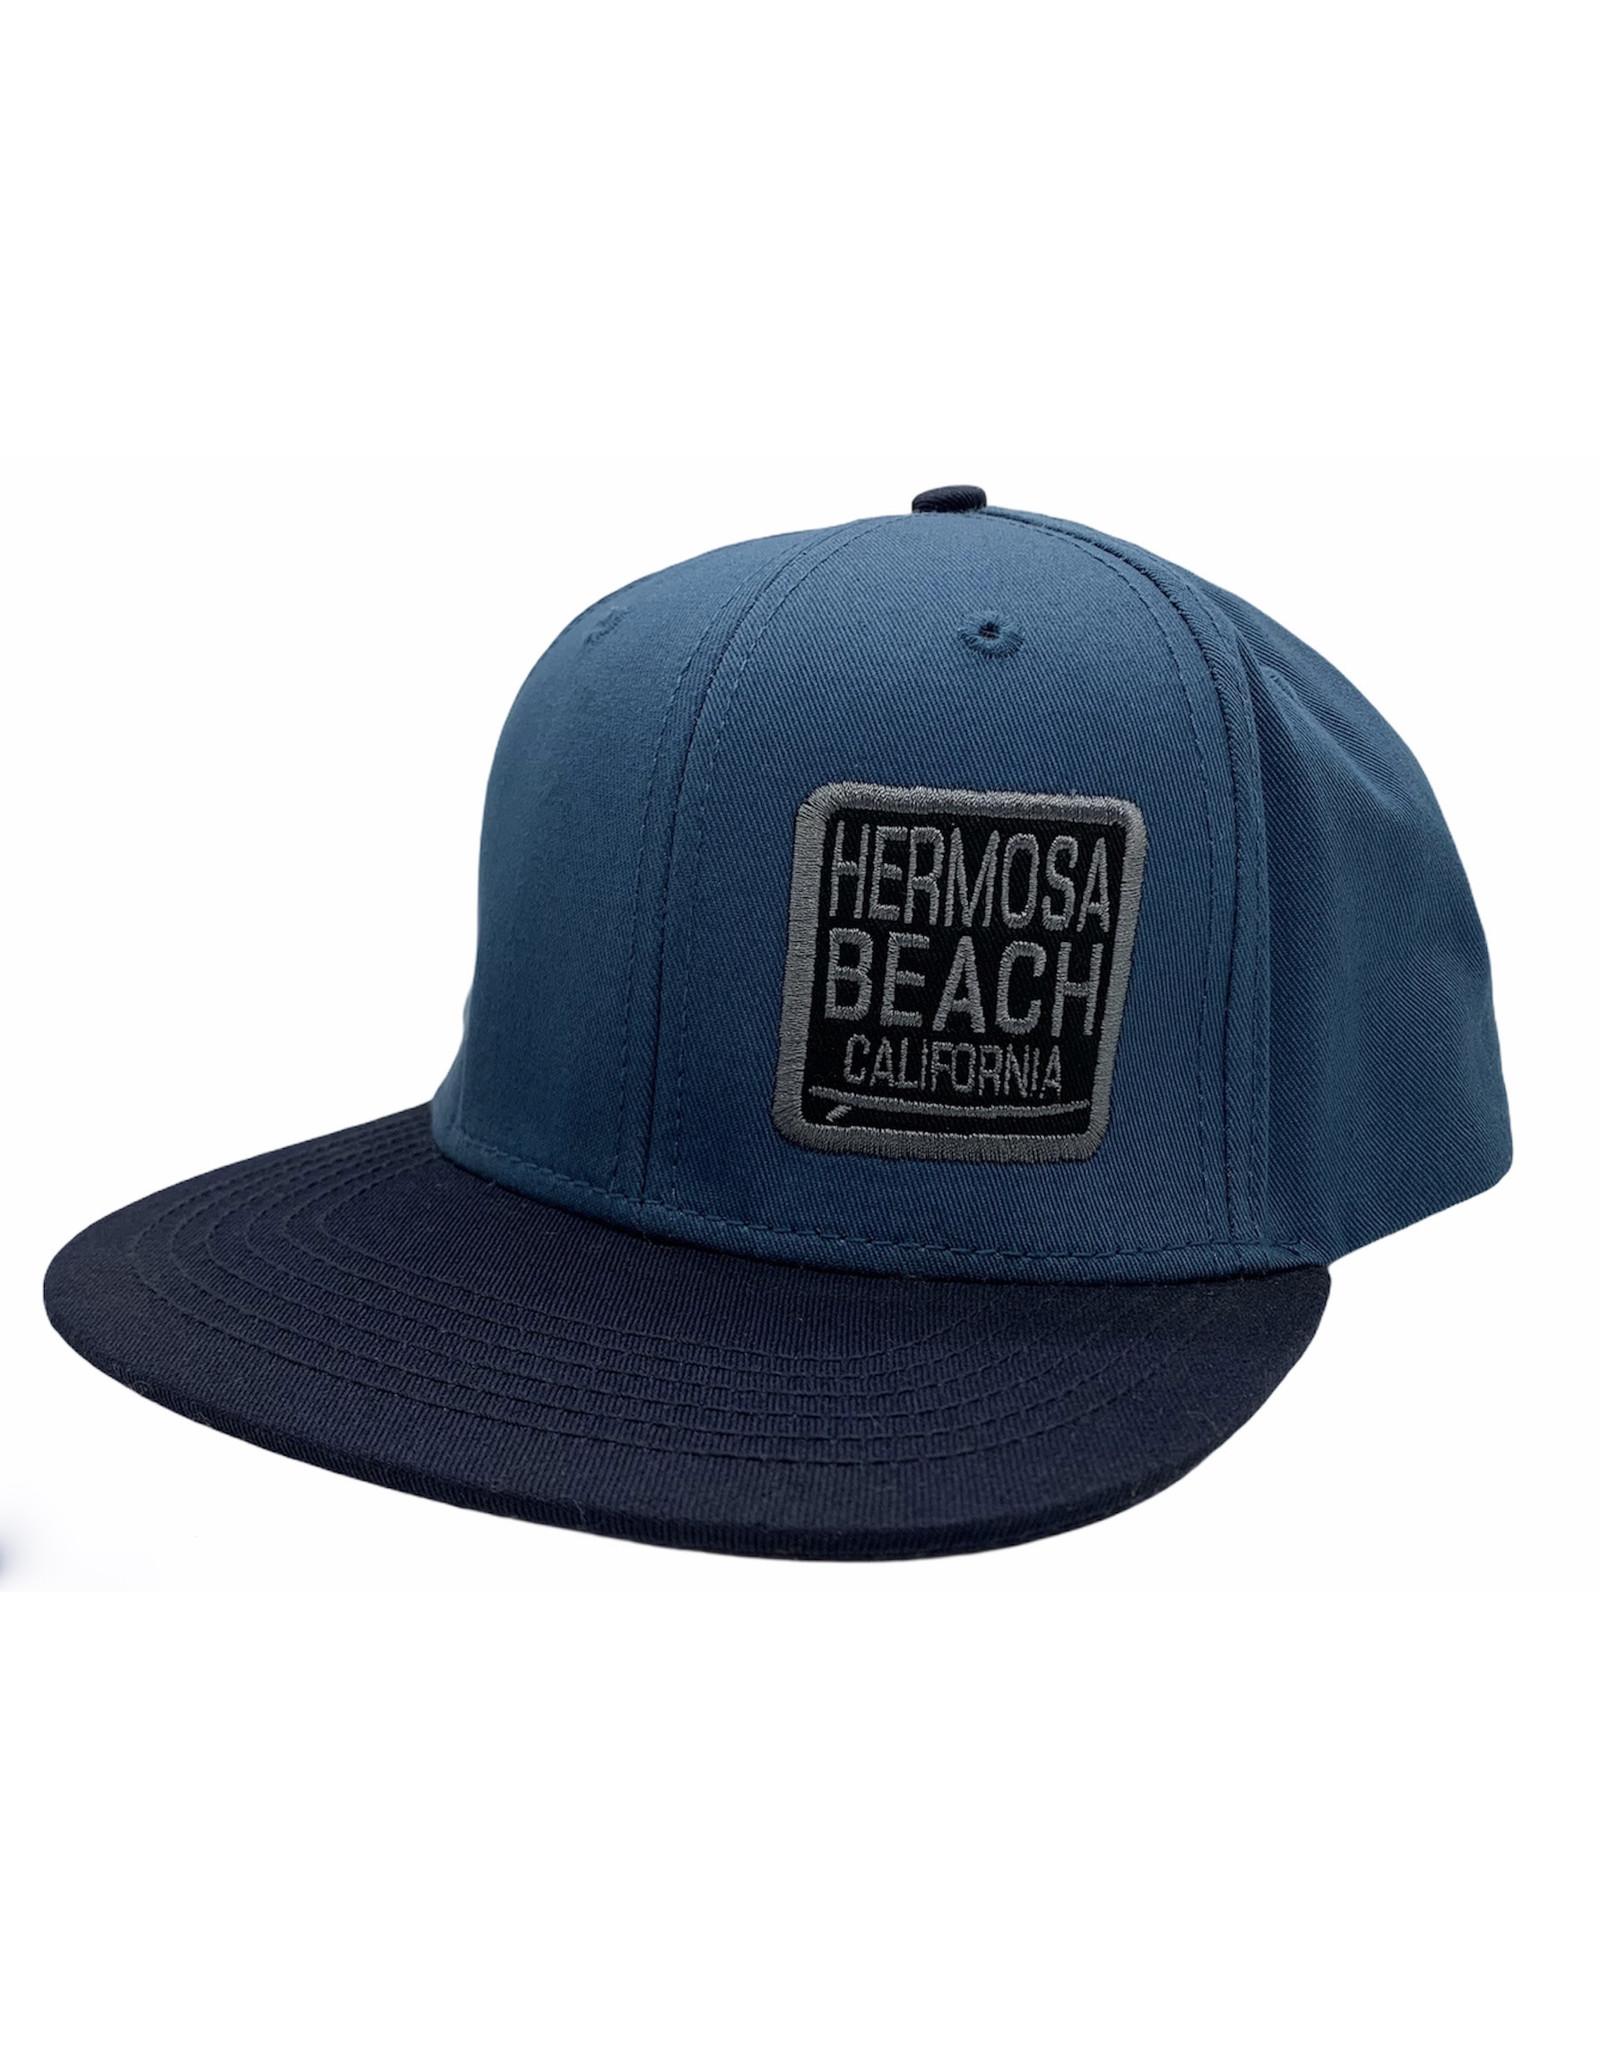 Blue 84 #FF HB  SURFBOARD SQUARE ANTIQUE SAPPHIRE HAT